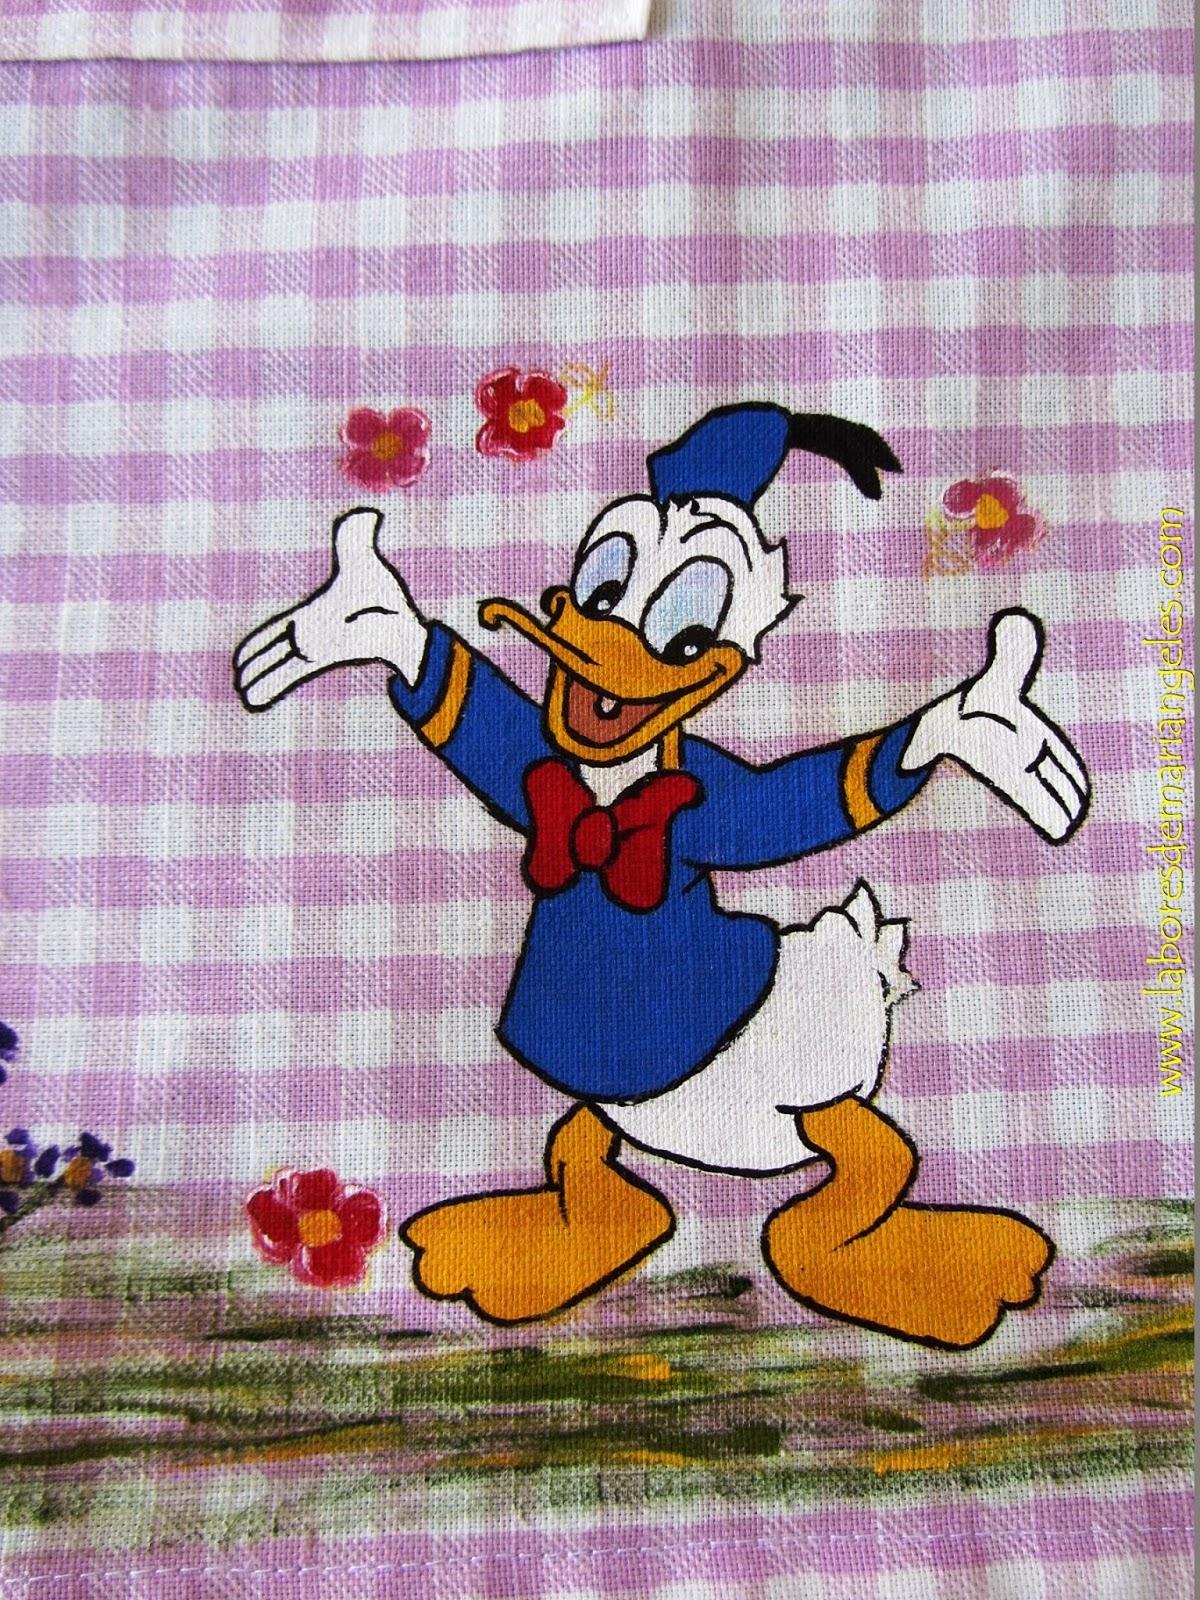 Labores de mari angeles dibujo del pato donald pintado a - Dibujos infantiles para pintar en tela ...